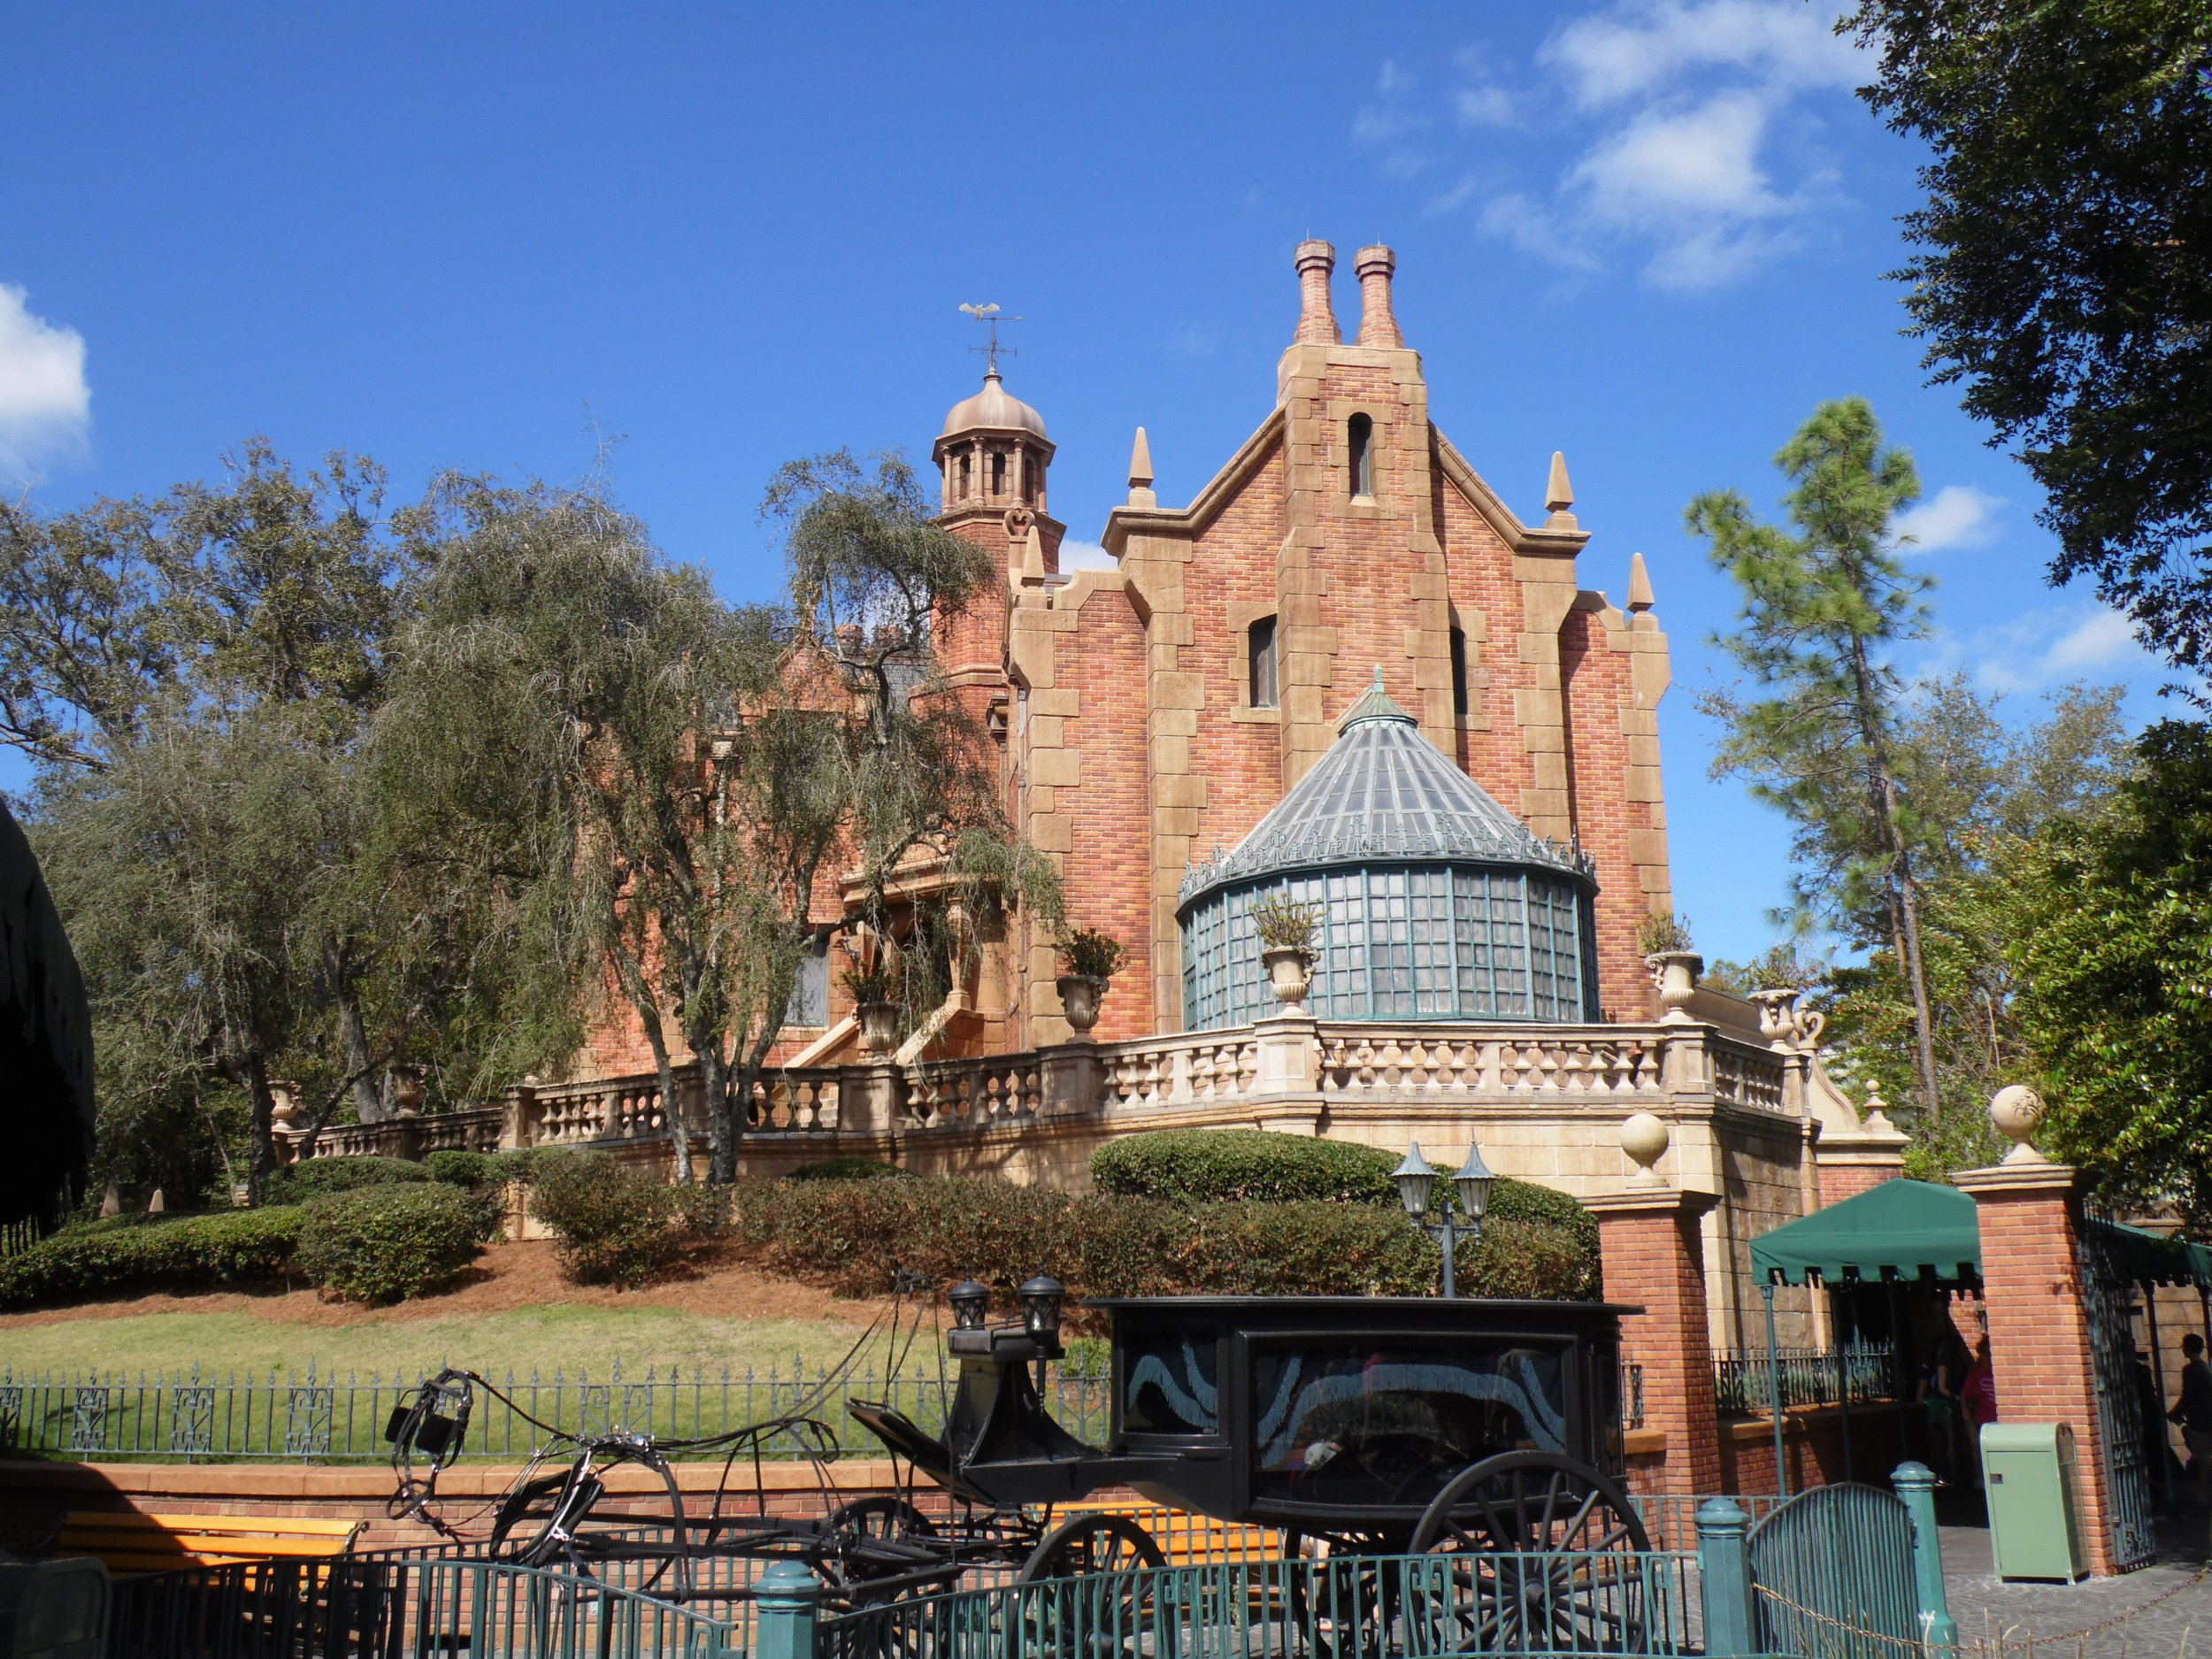 The Haunted Mansion, Liberty Square, Magic Kingdom